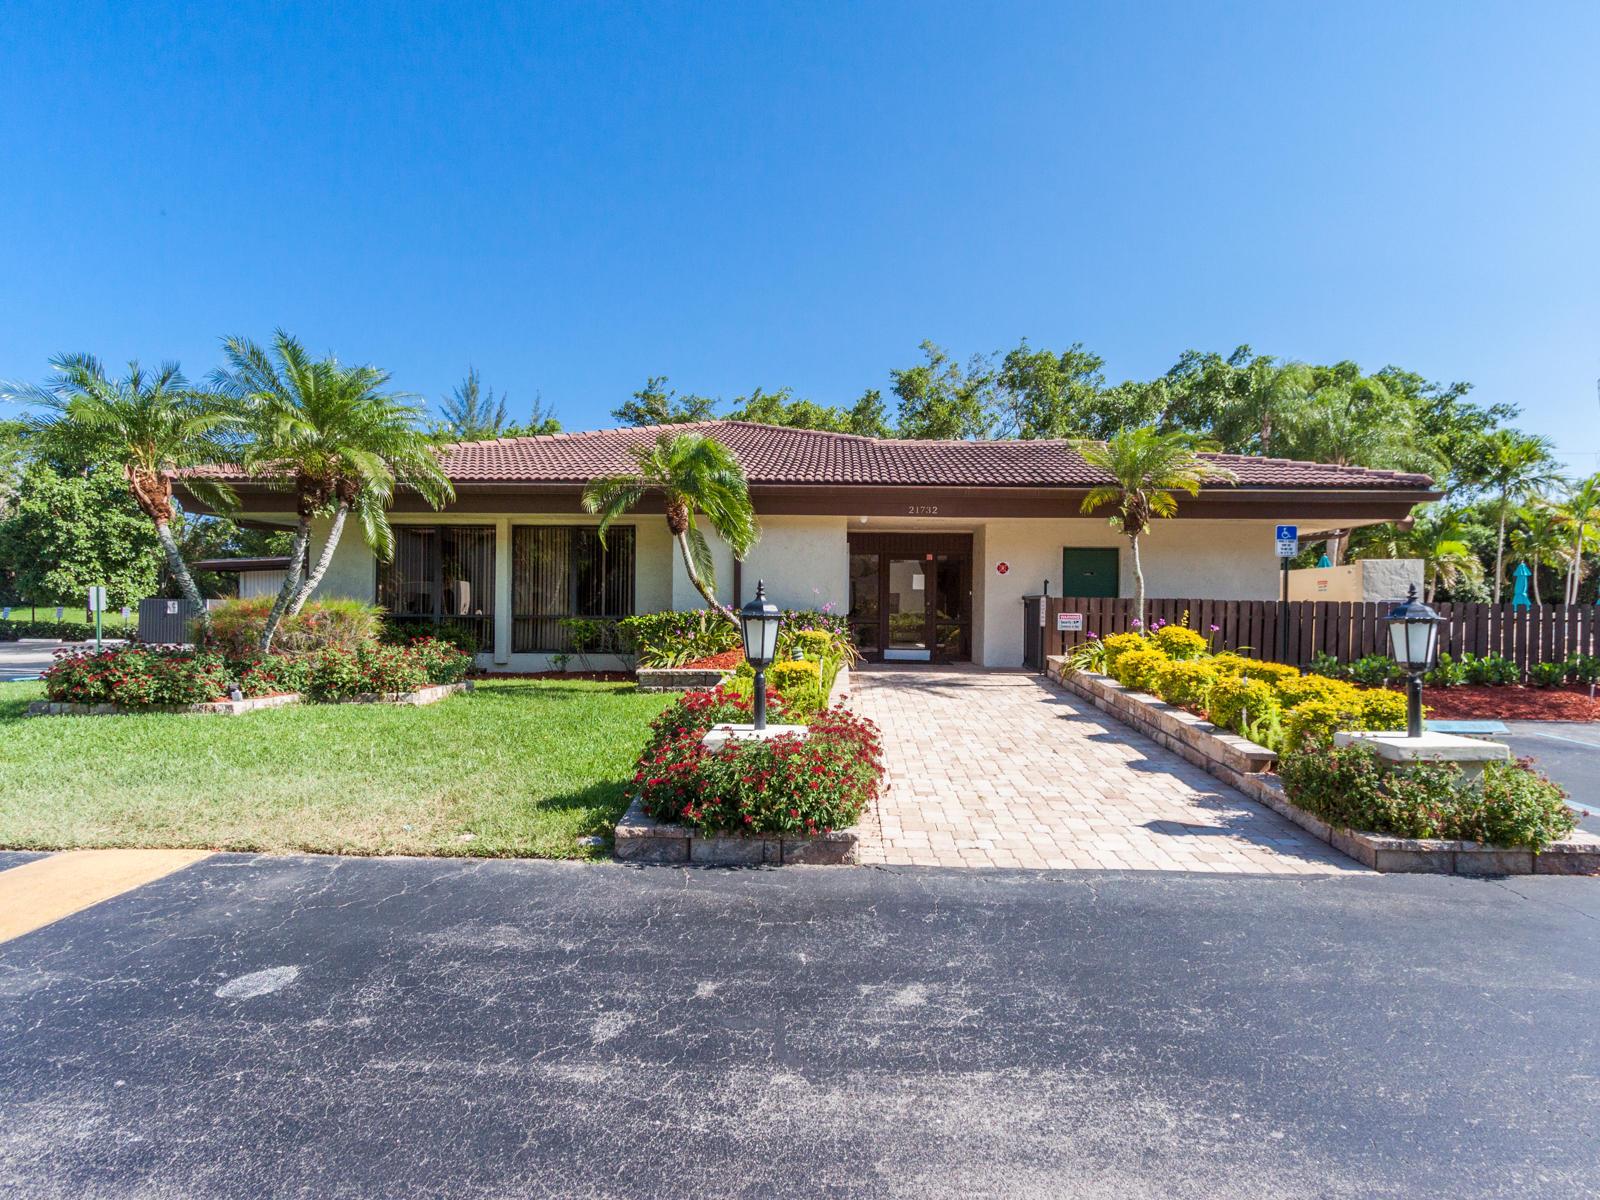 21856 Arriba Real #5-b Boca Raton, FL 33433